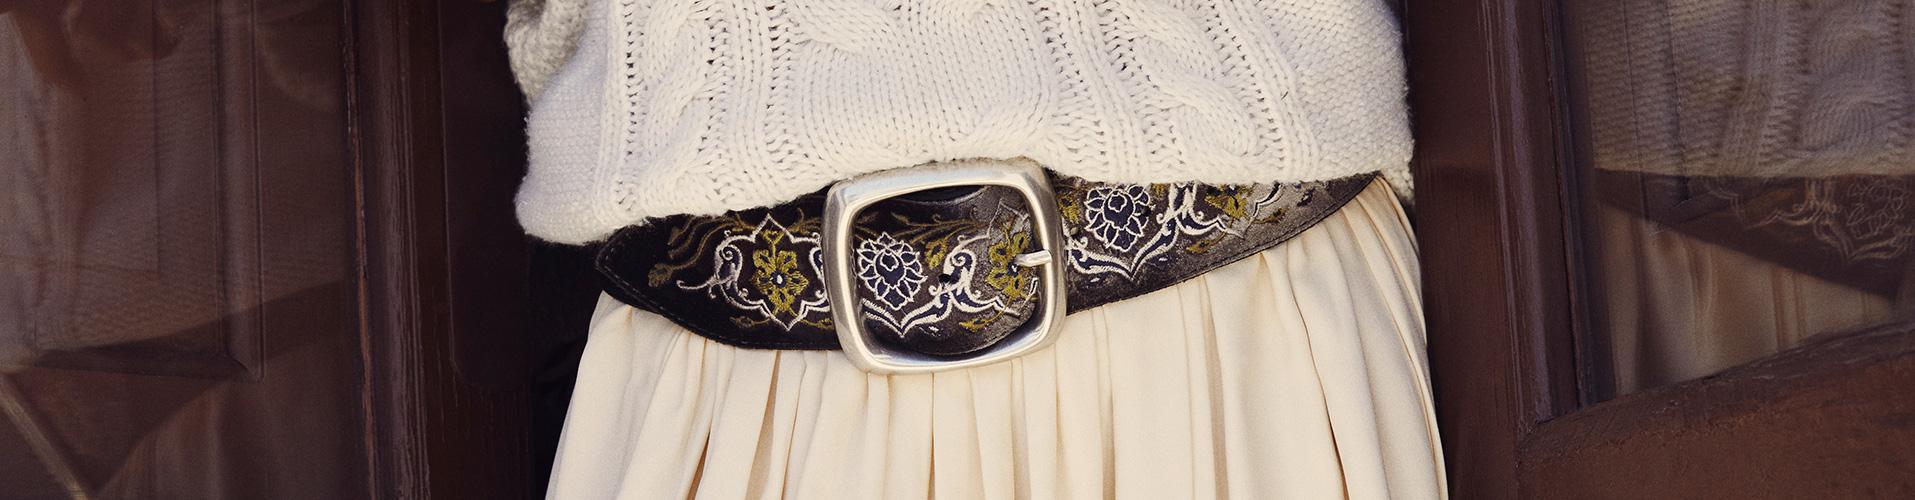 ORCIANI | Women's Belts collection. Leather Belts | Shop online